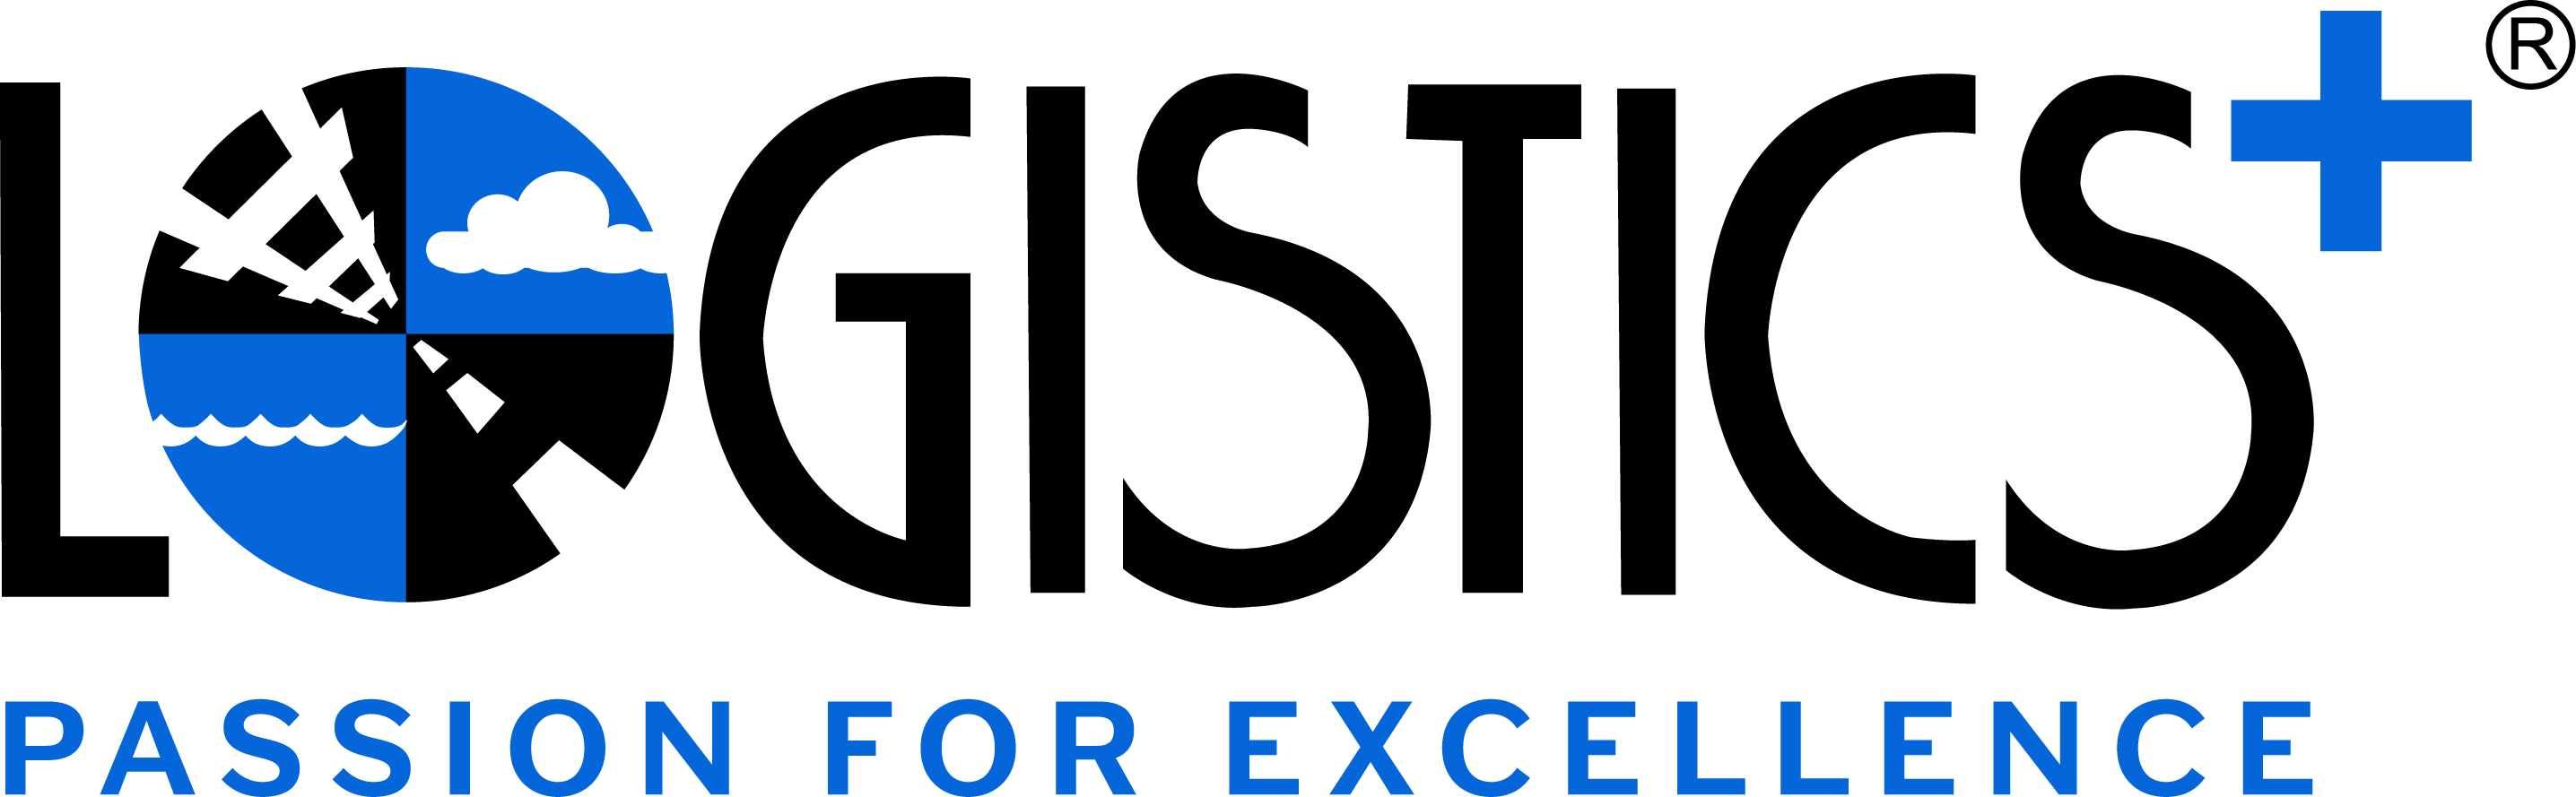 Logistics Plus Logo - slogan